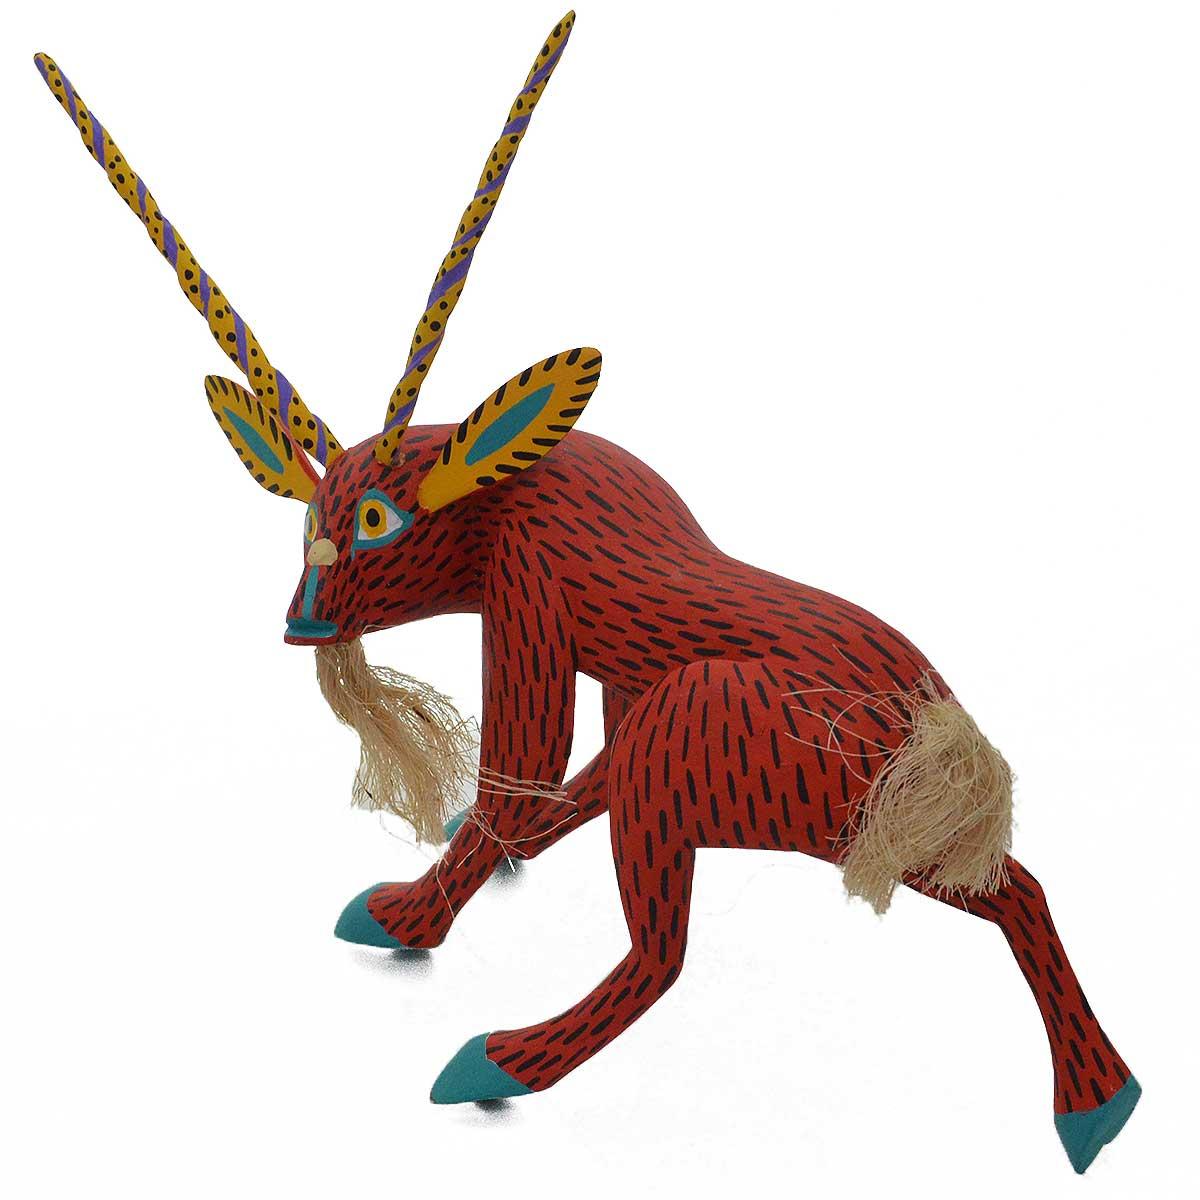 Moises Jimenez & Oralia Cardenas Moises Jimenez & Oralia Cardenas: Red Goat Goat